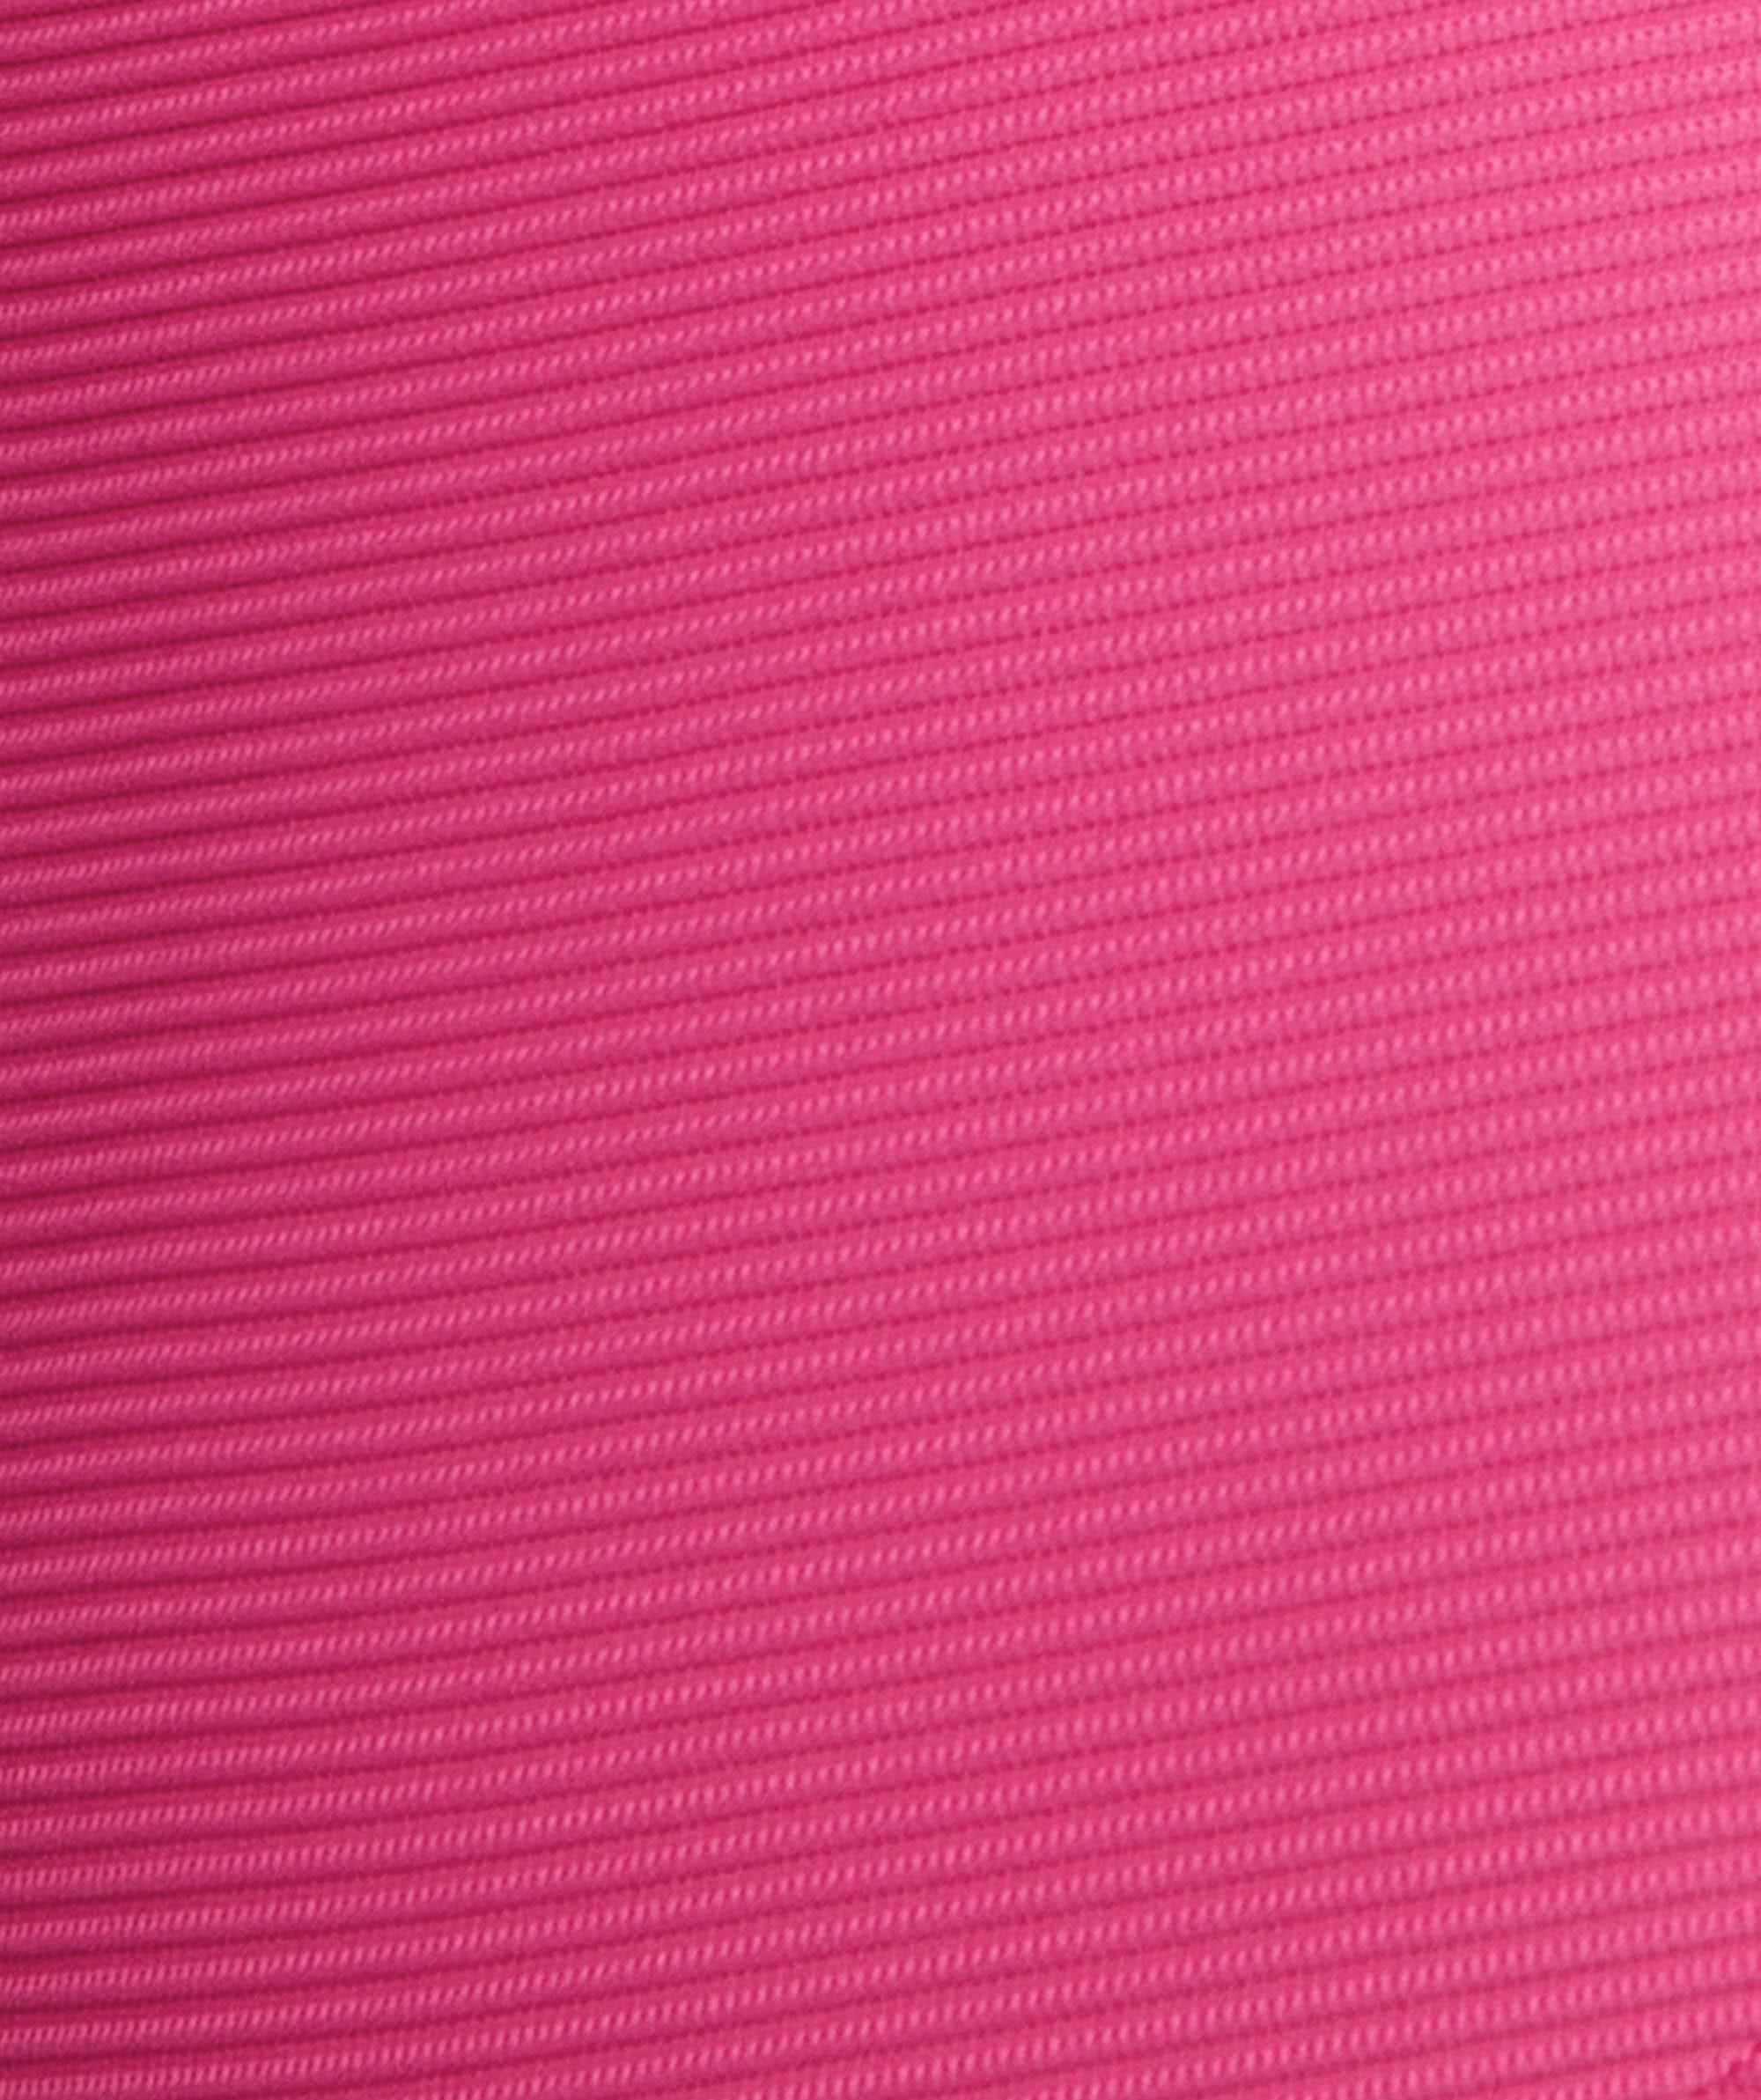 Vamp Tangier Triangle Swim Top - Fuchsia Pink